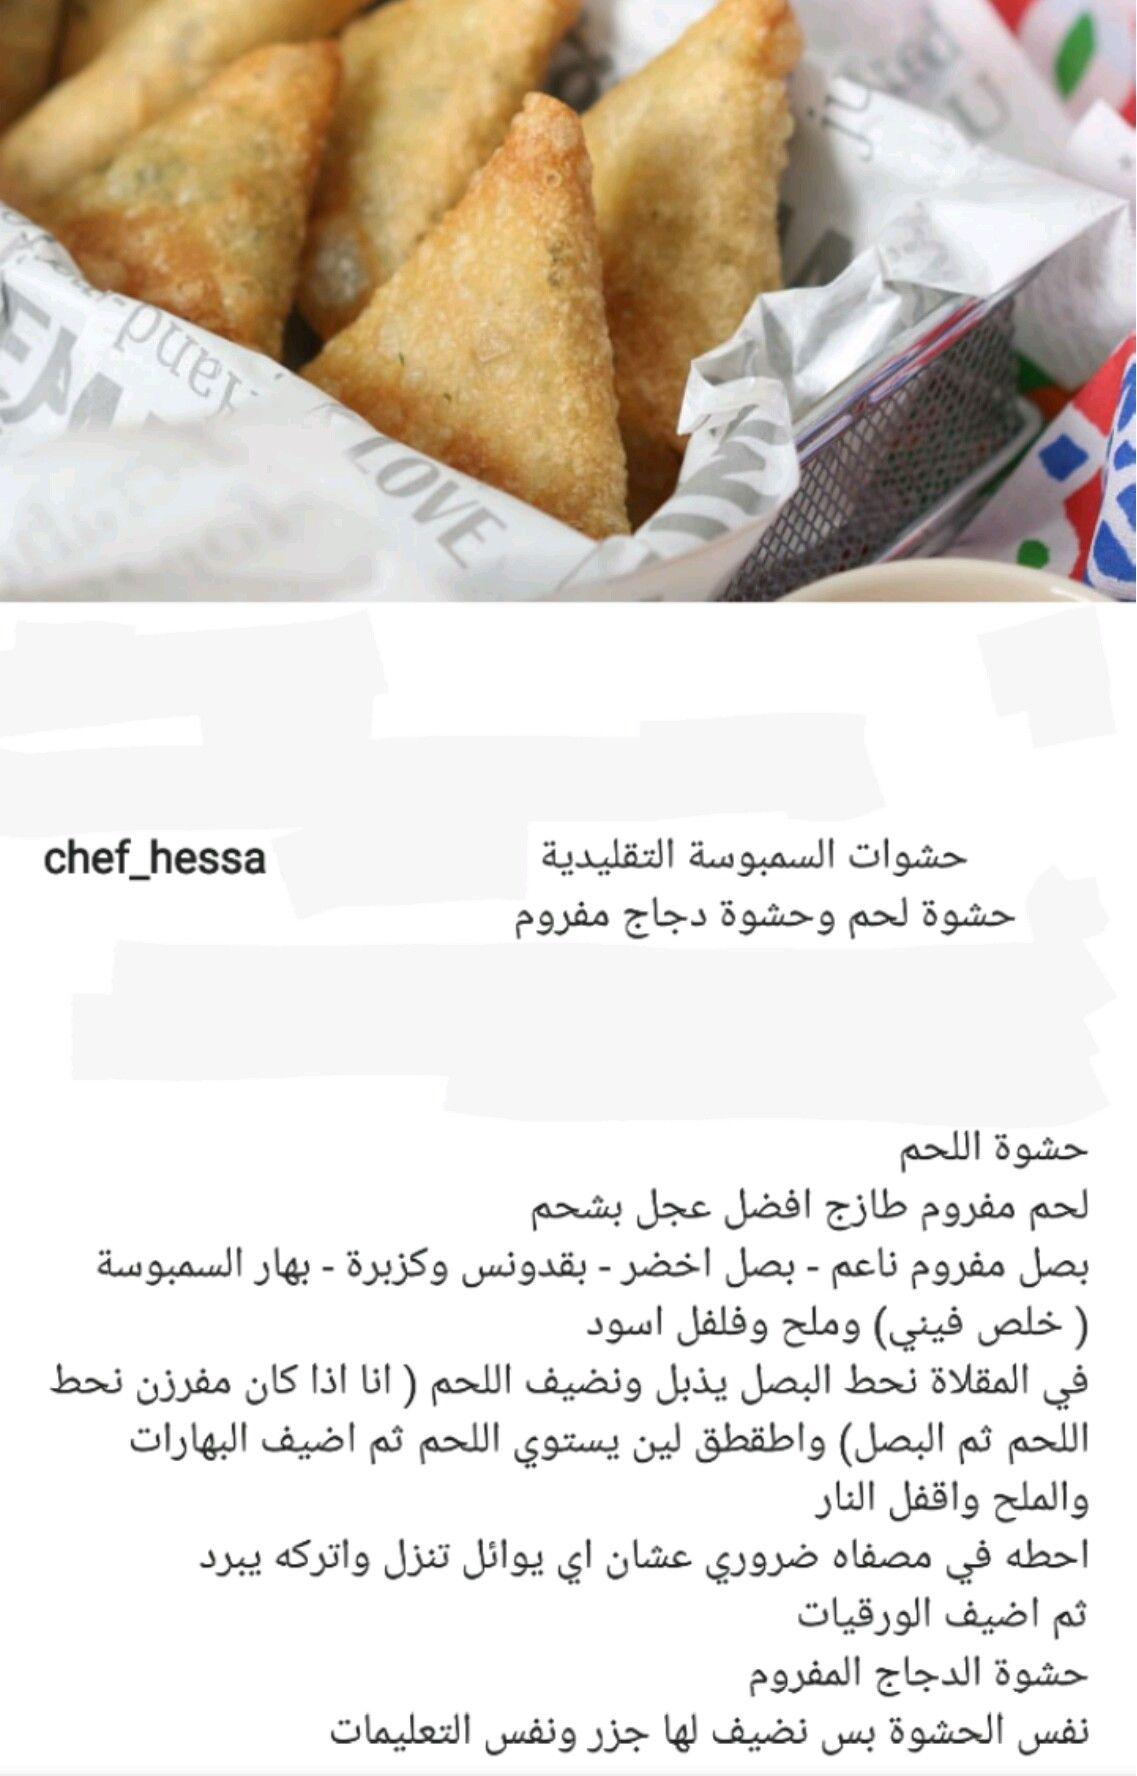 Pin By Asma Alotaibi On طبخ Bedroom Wall Designs Recipes Pu Er